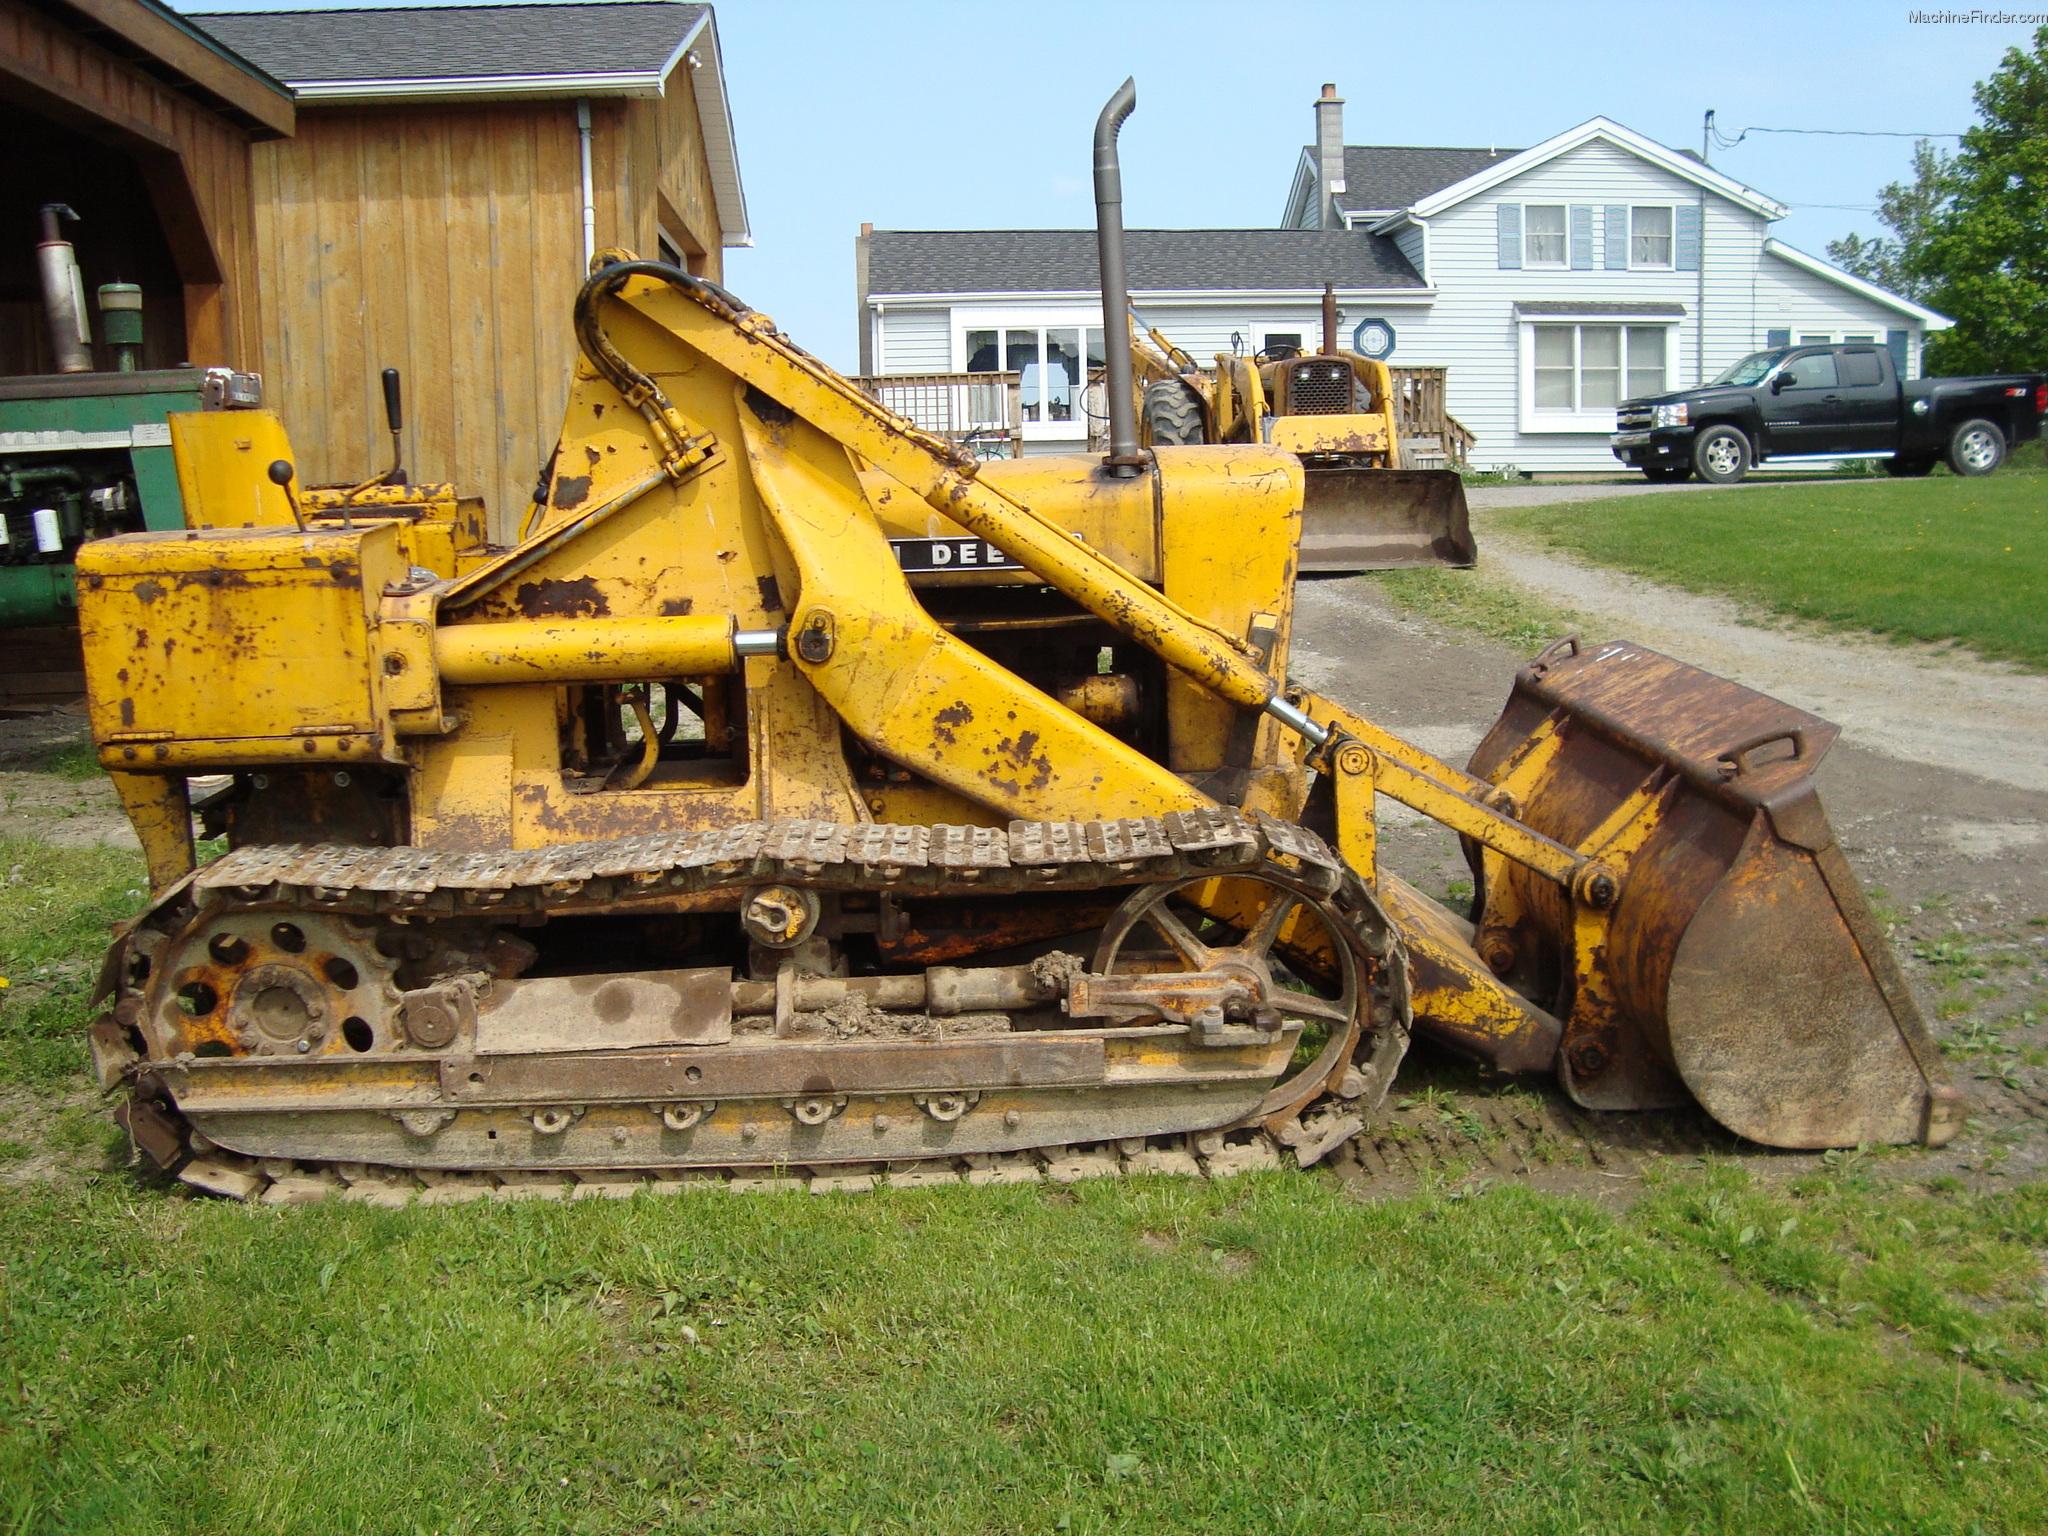 John Deere 1010 Construction Equipment & Forklifts - John Deere MachineFinder